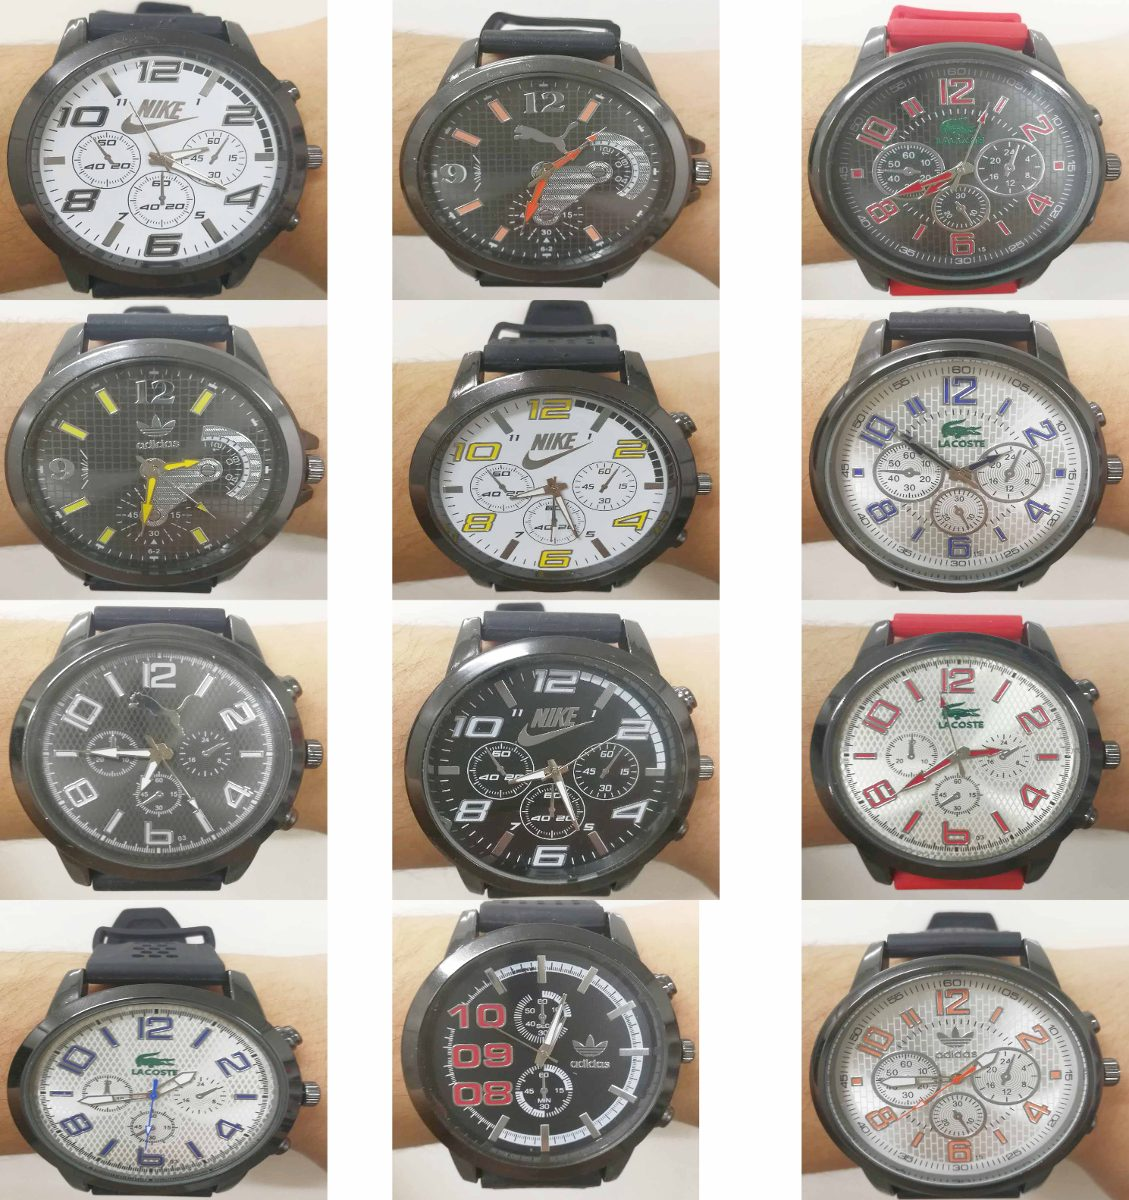 d60a5ee7445 relógio masculino atacado kit 20 marcas varias frete grátis. Carregando zoom .